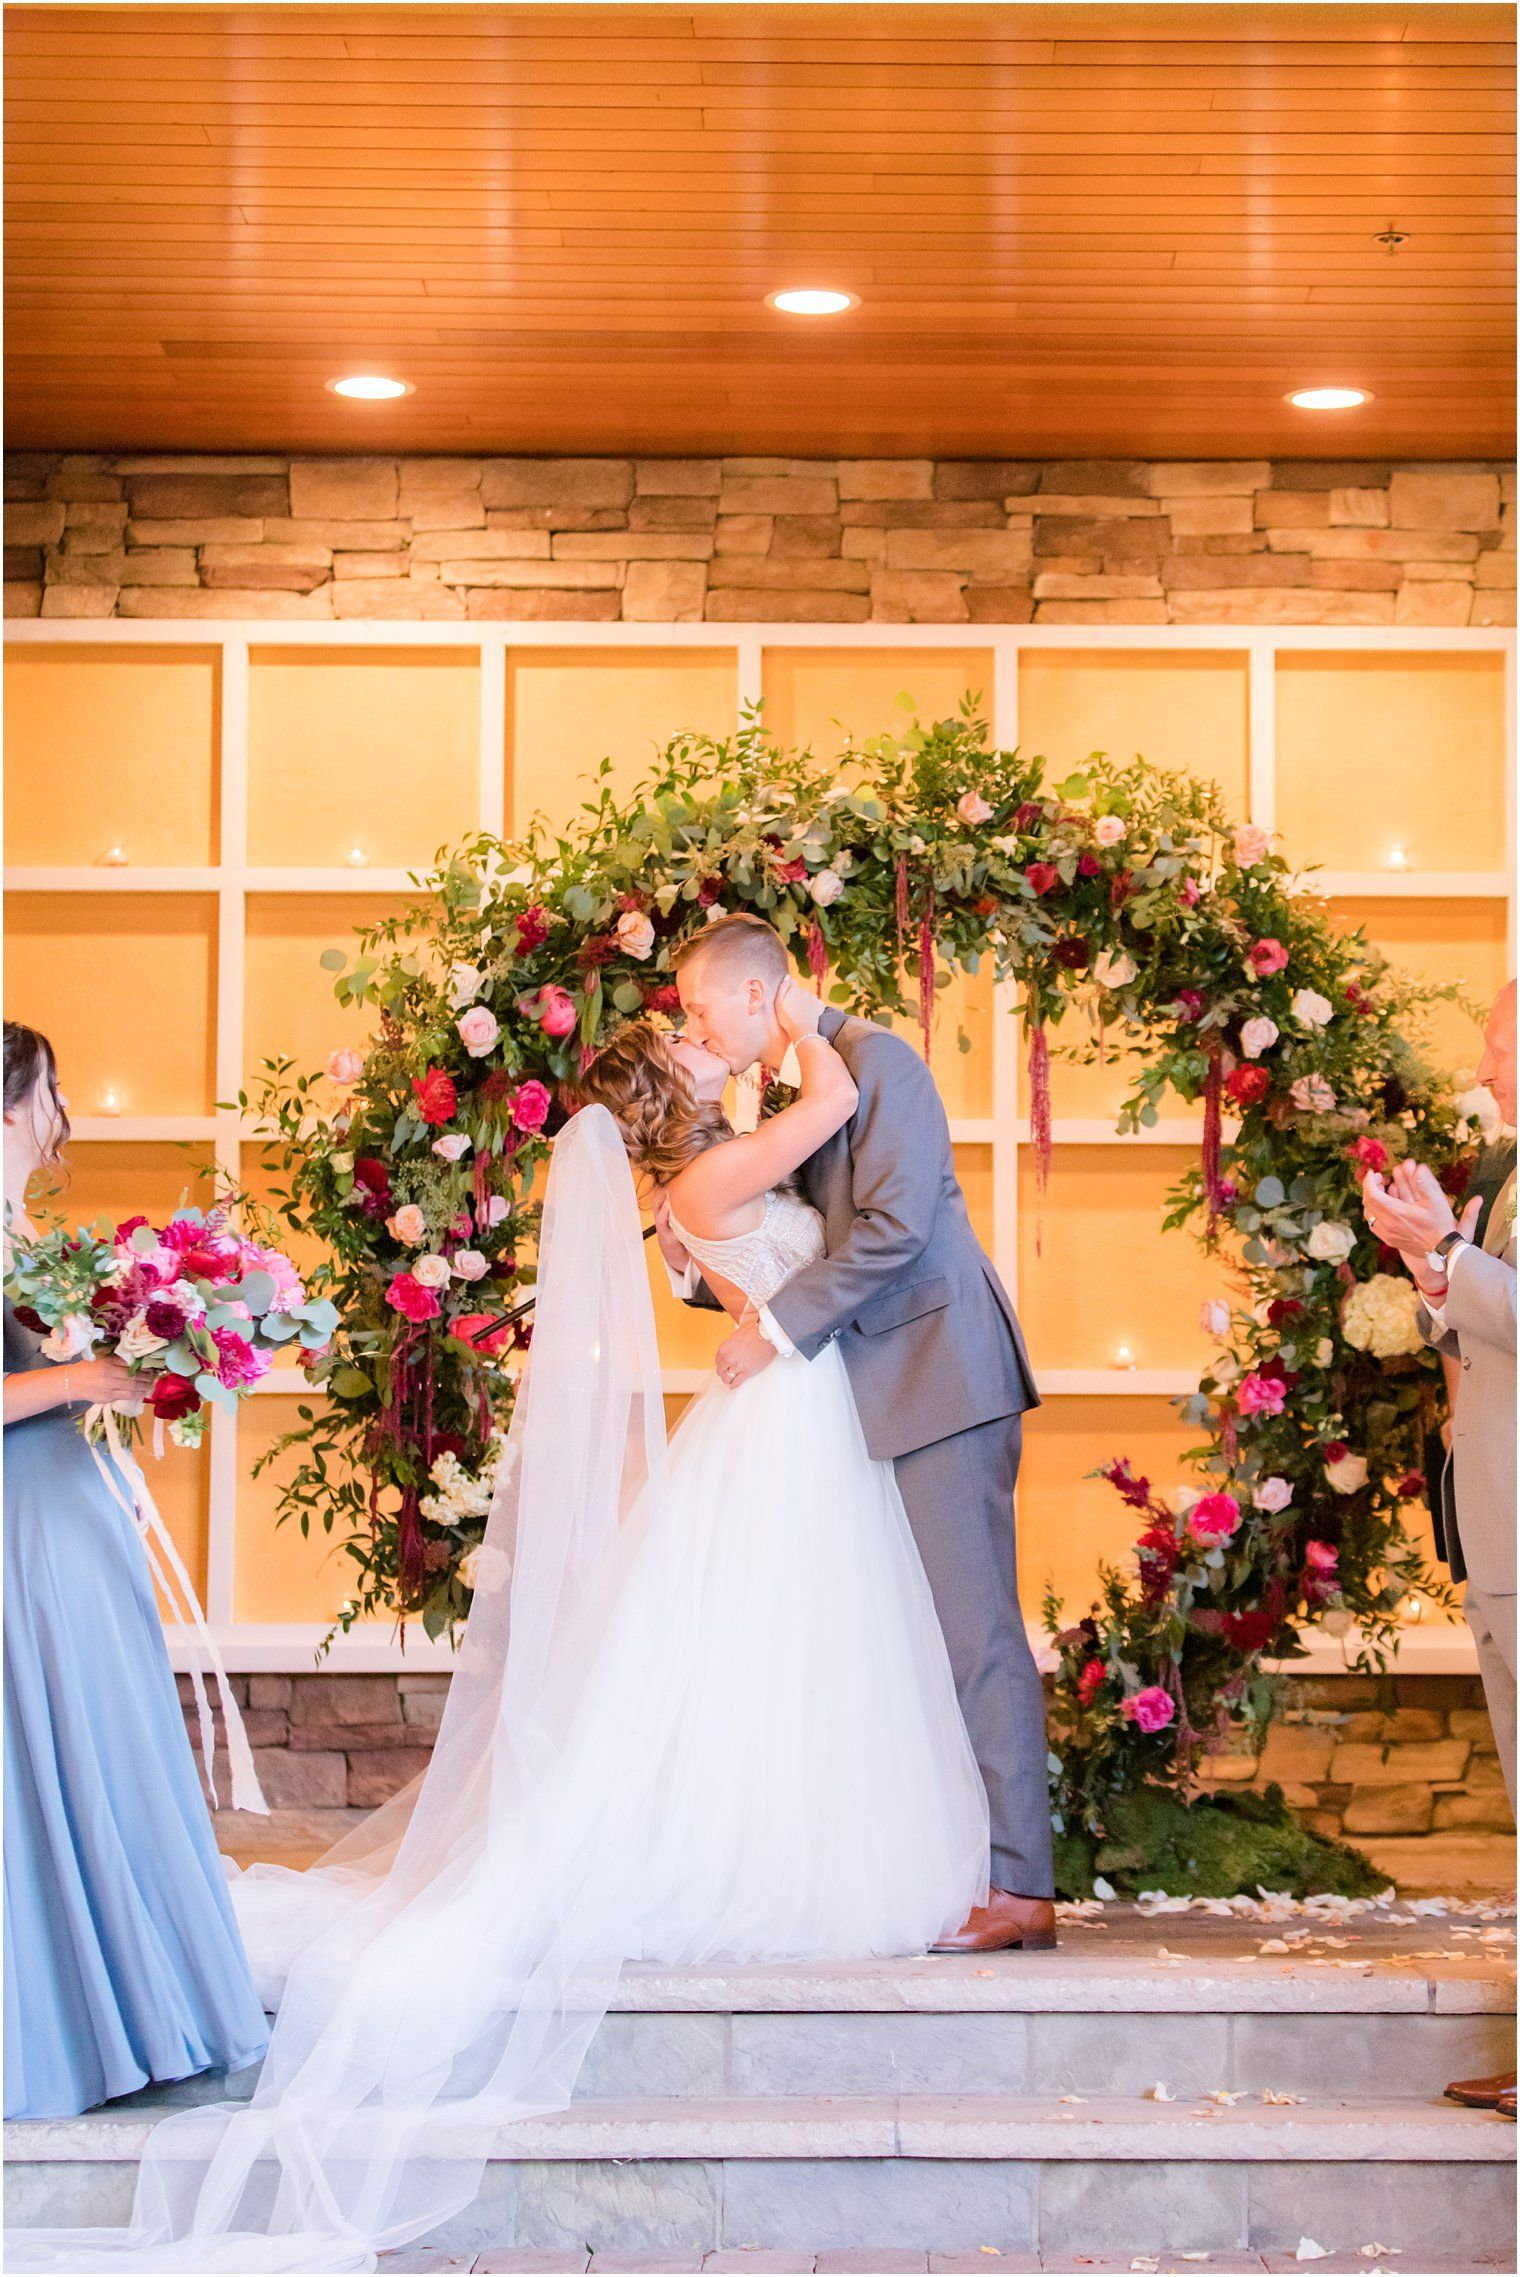 Stone House At Stirling Ridge Wedding Photos Wedding Wedding Ceremony Decorations Nj Wedding Venues